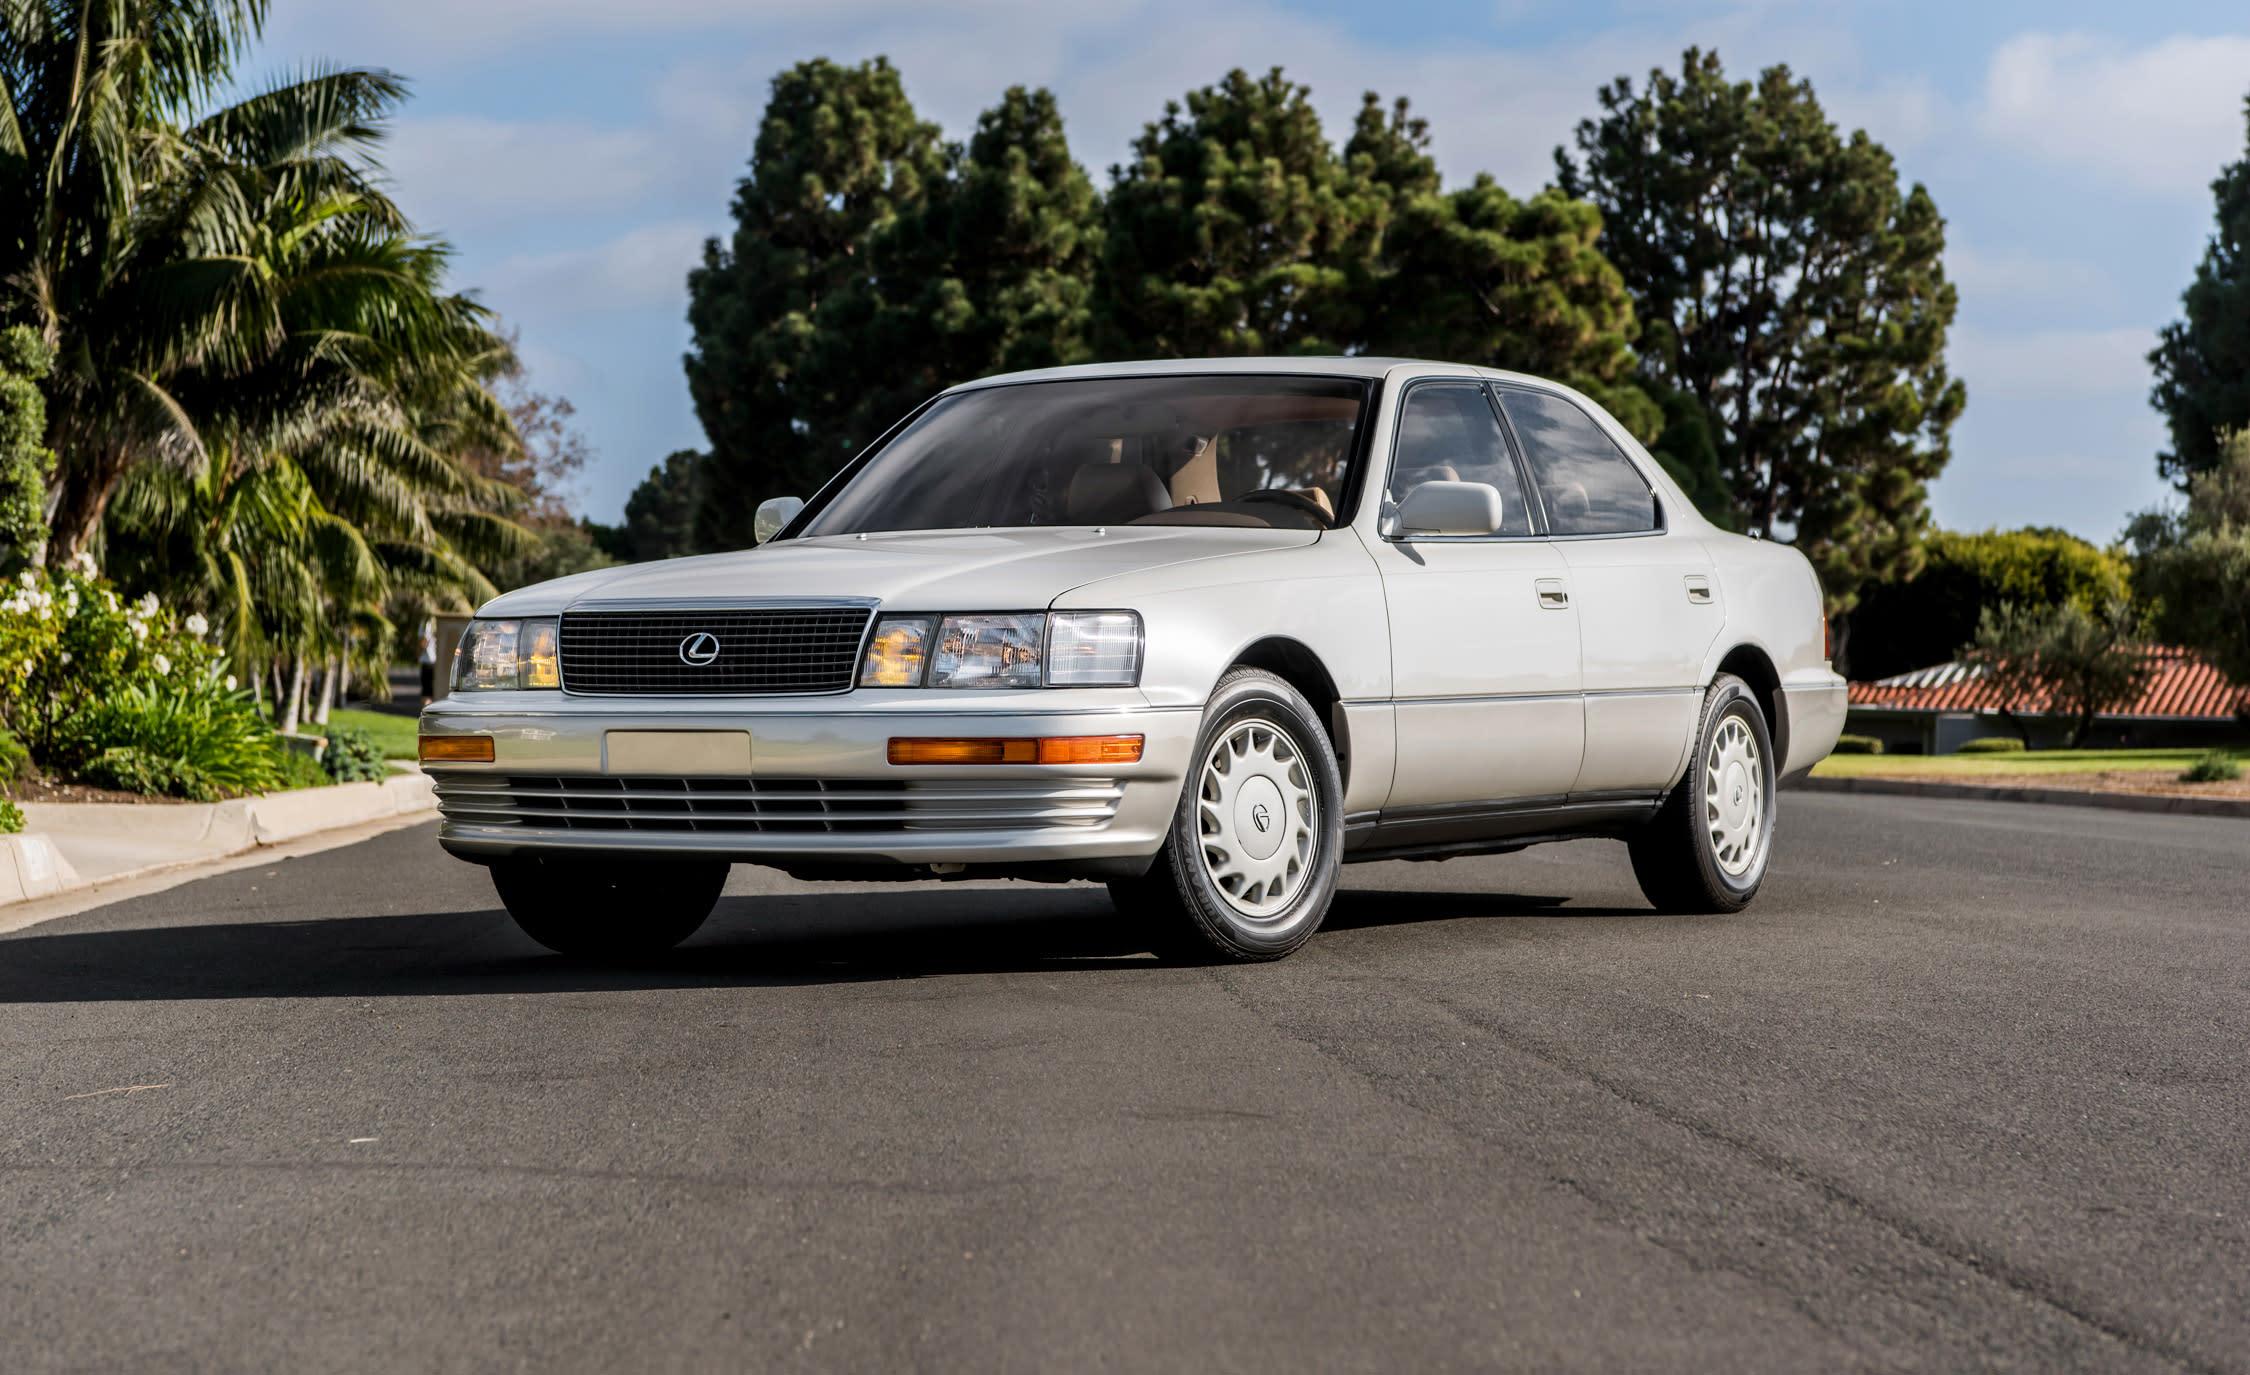 Luxury, Japan Style: Revisiting the Original Lexus LS400